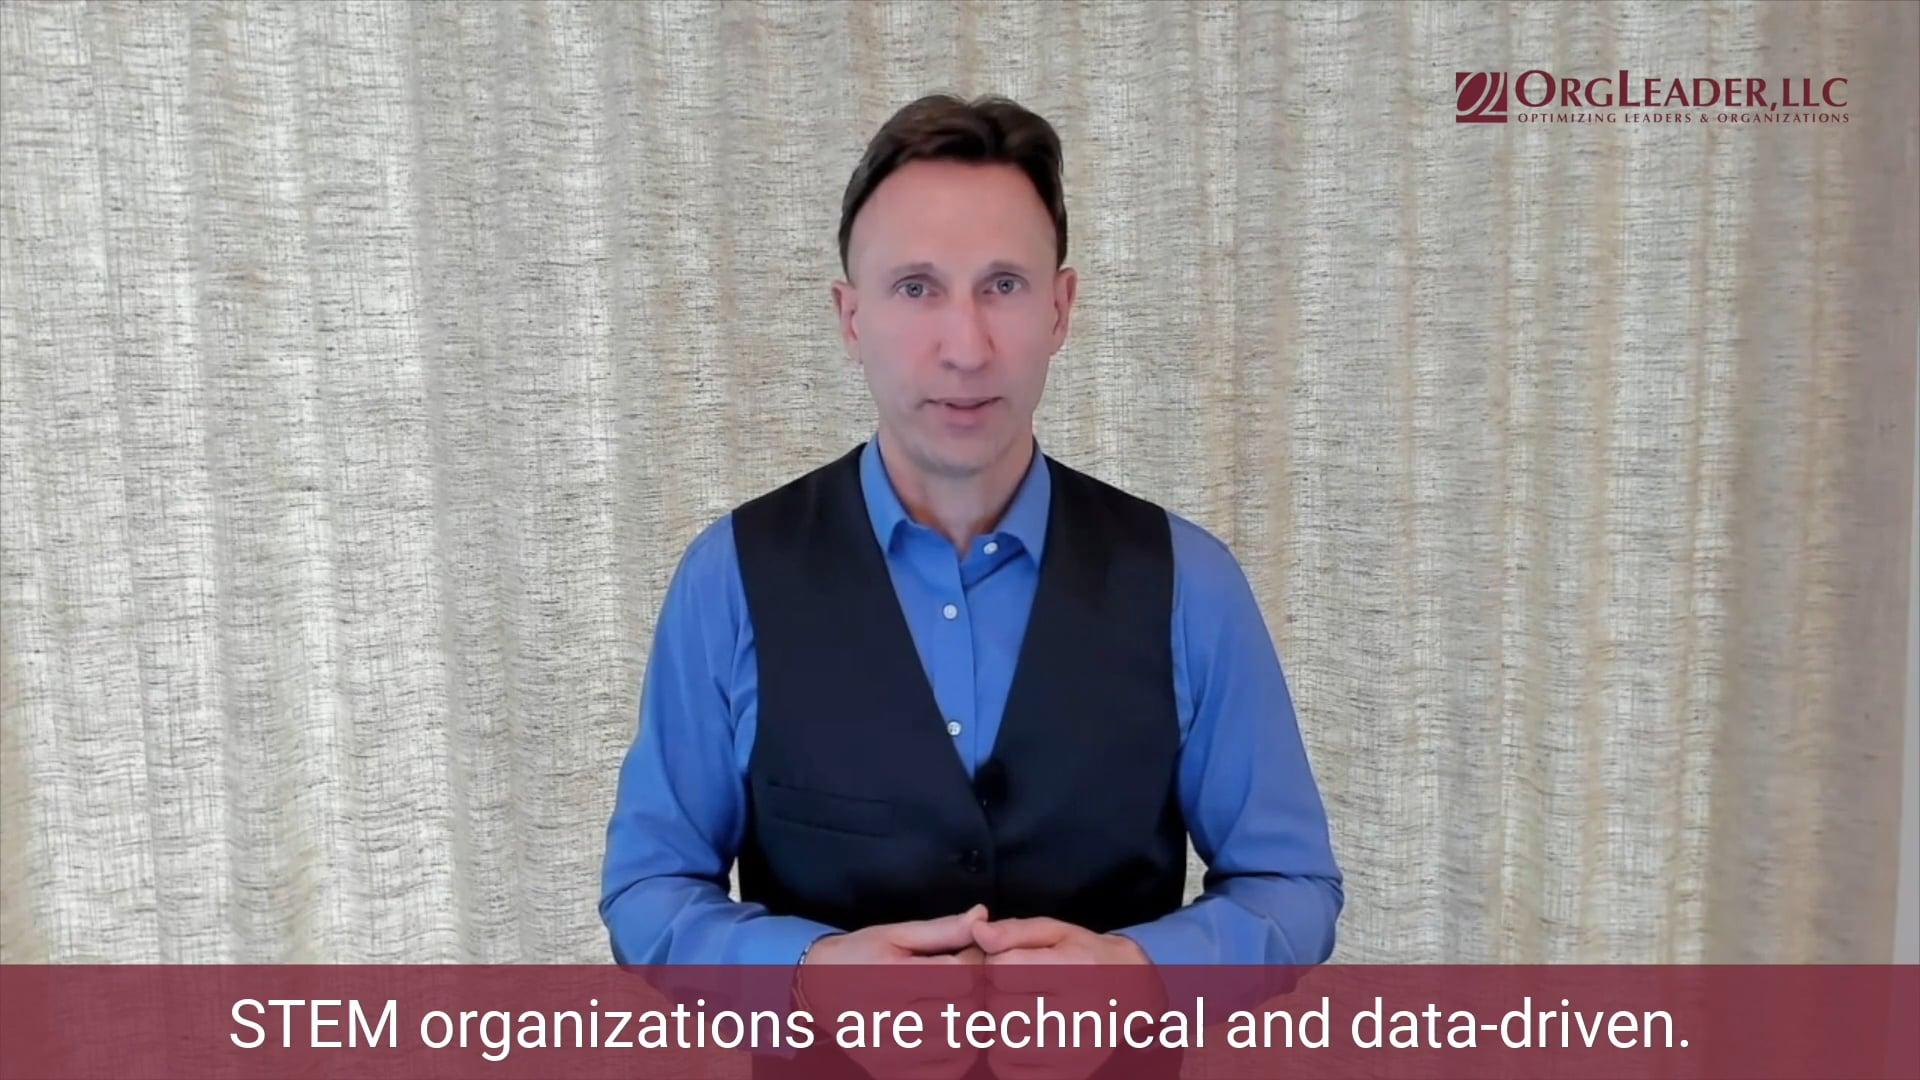 Ryan Lahti - Why STEM Organizations Are Important